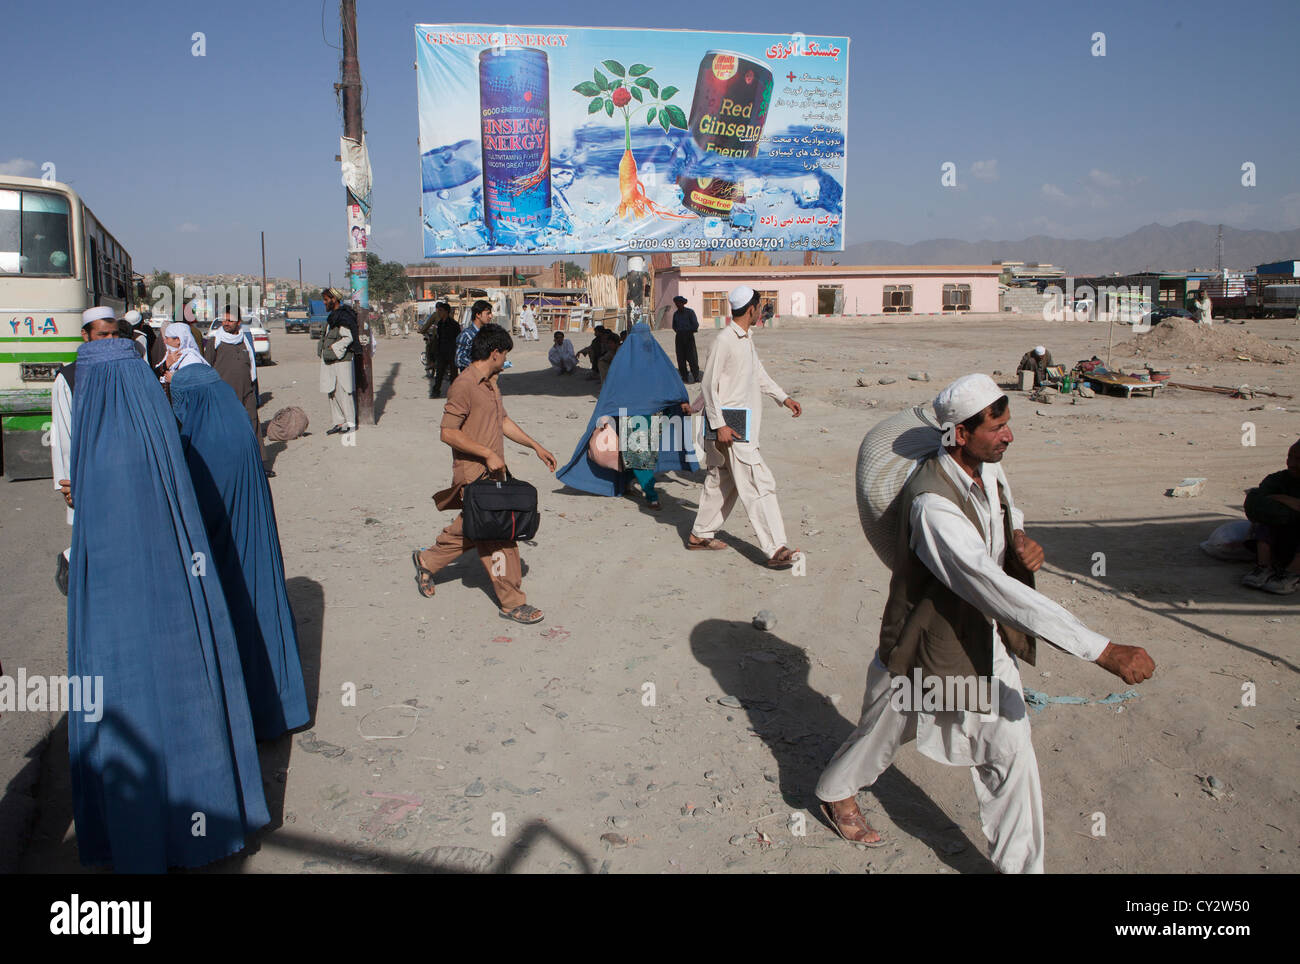 advertisement of energy drink in kabul, Afghanistan - Stock Image